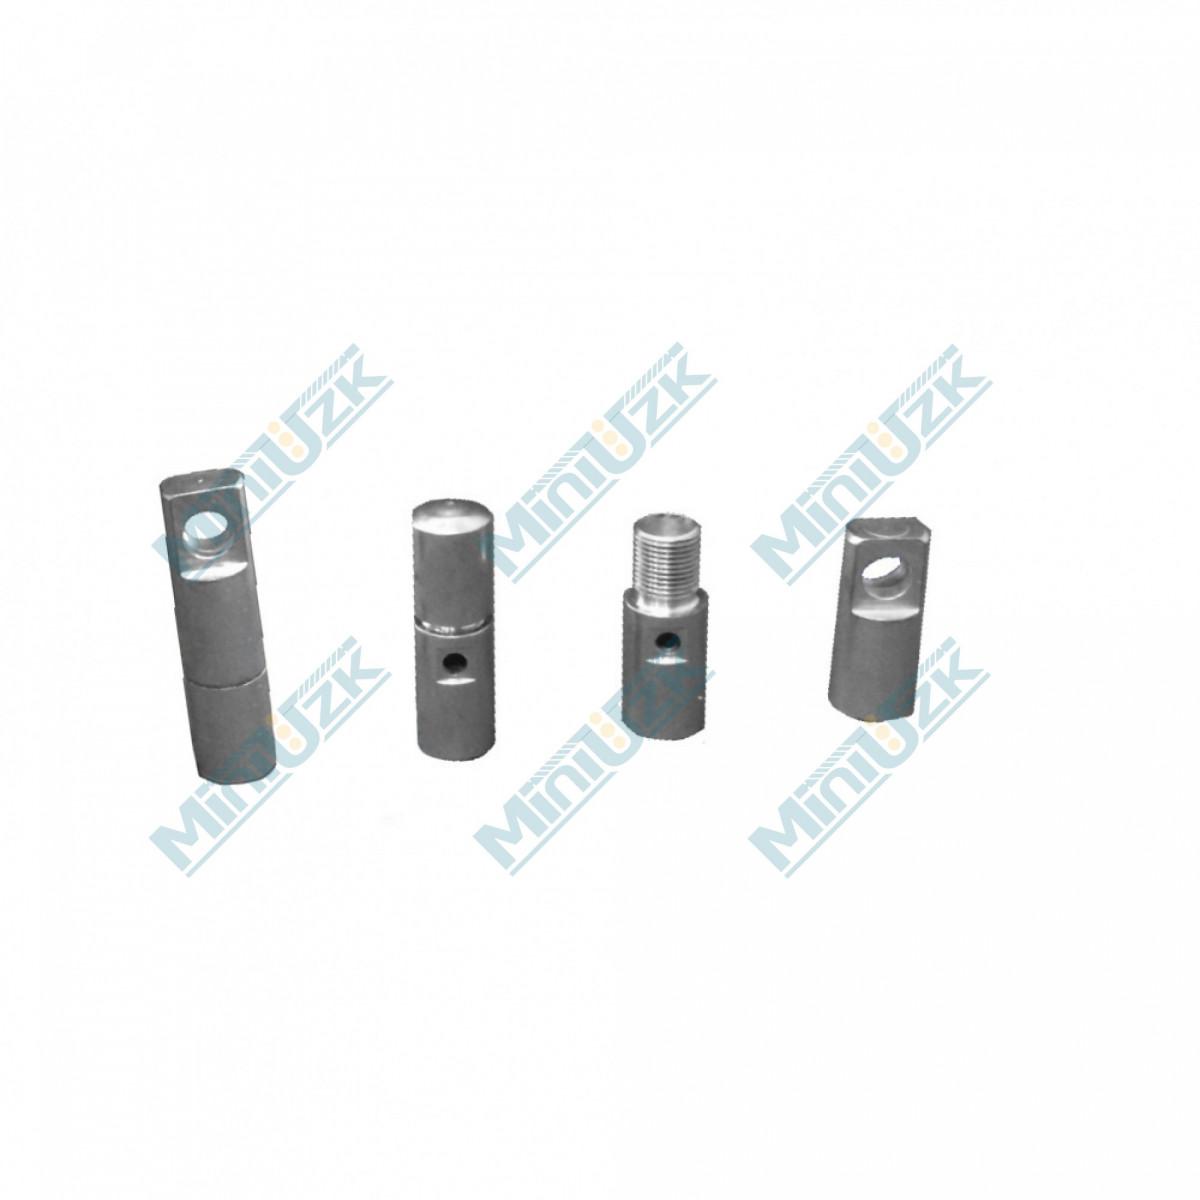 Устройство закладки кабеля (УЗК) OlmiOn СП-Т1-11/300